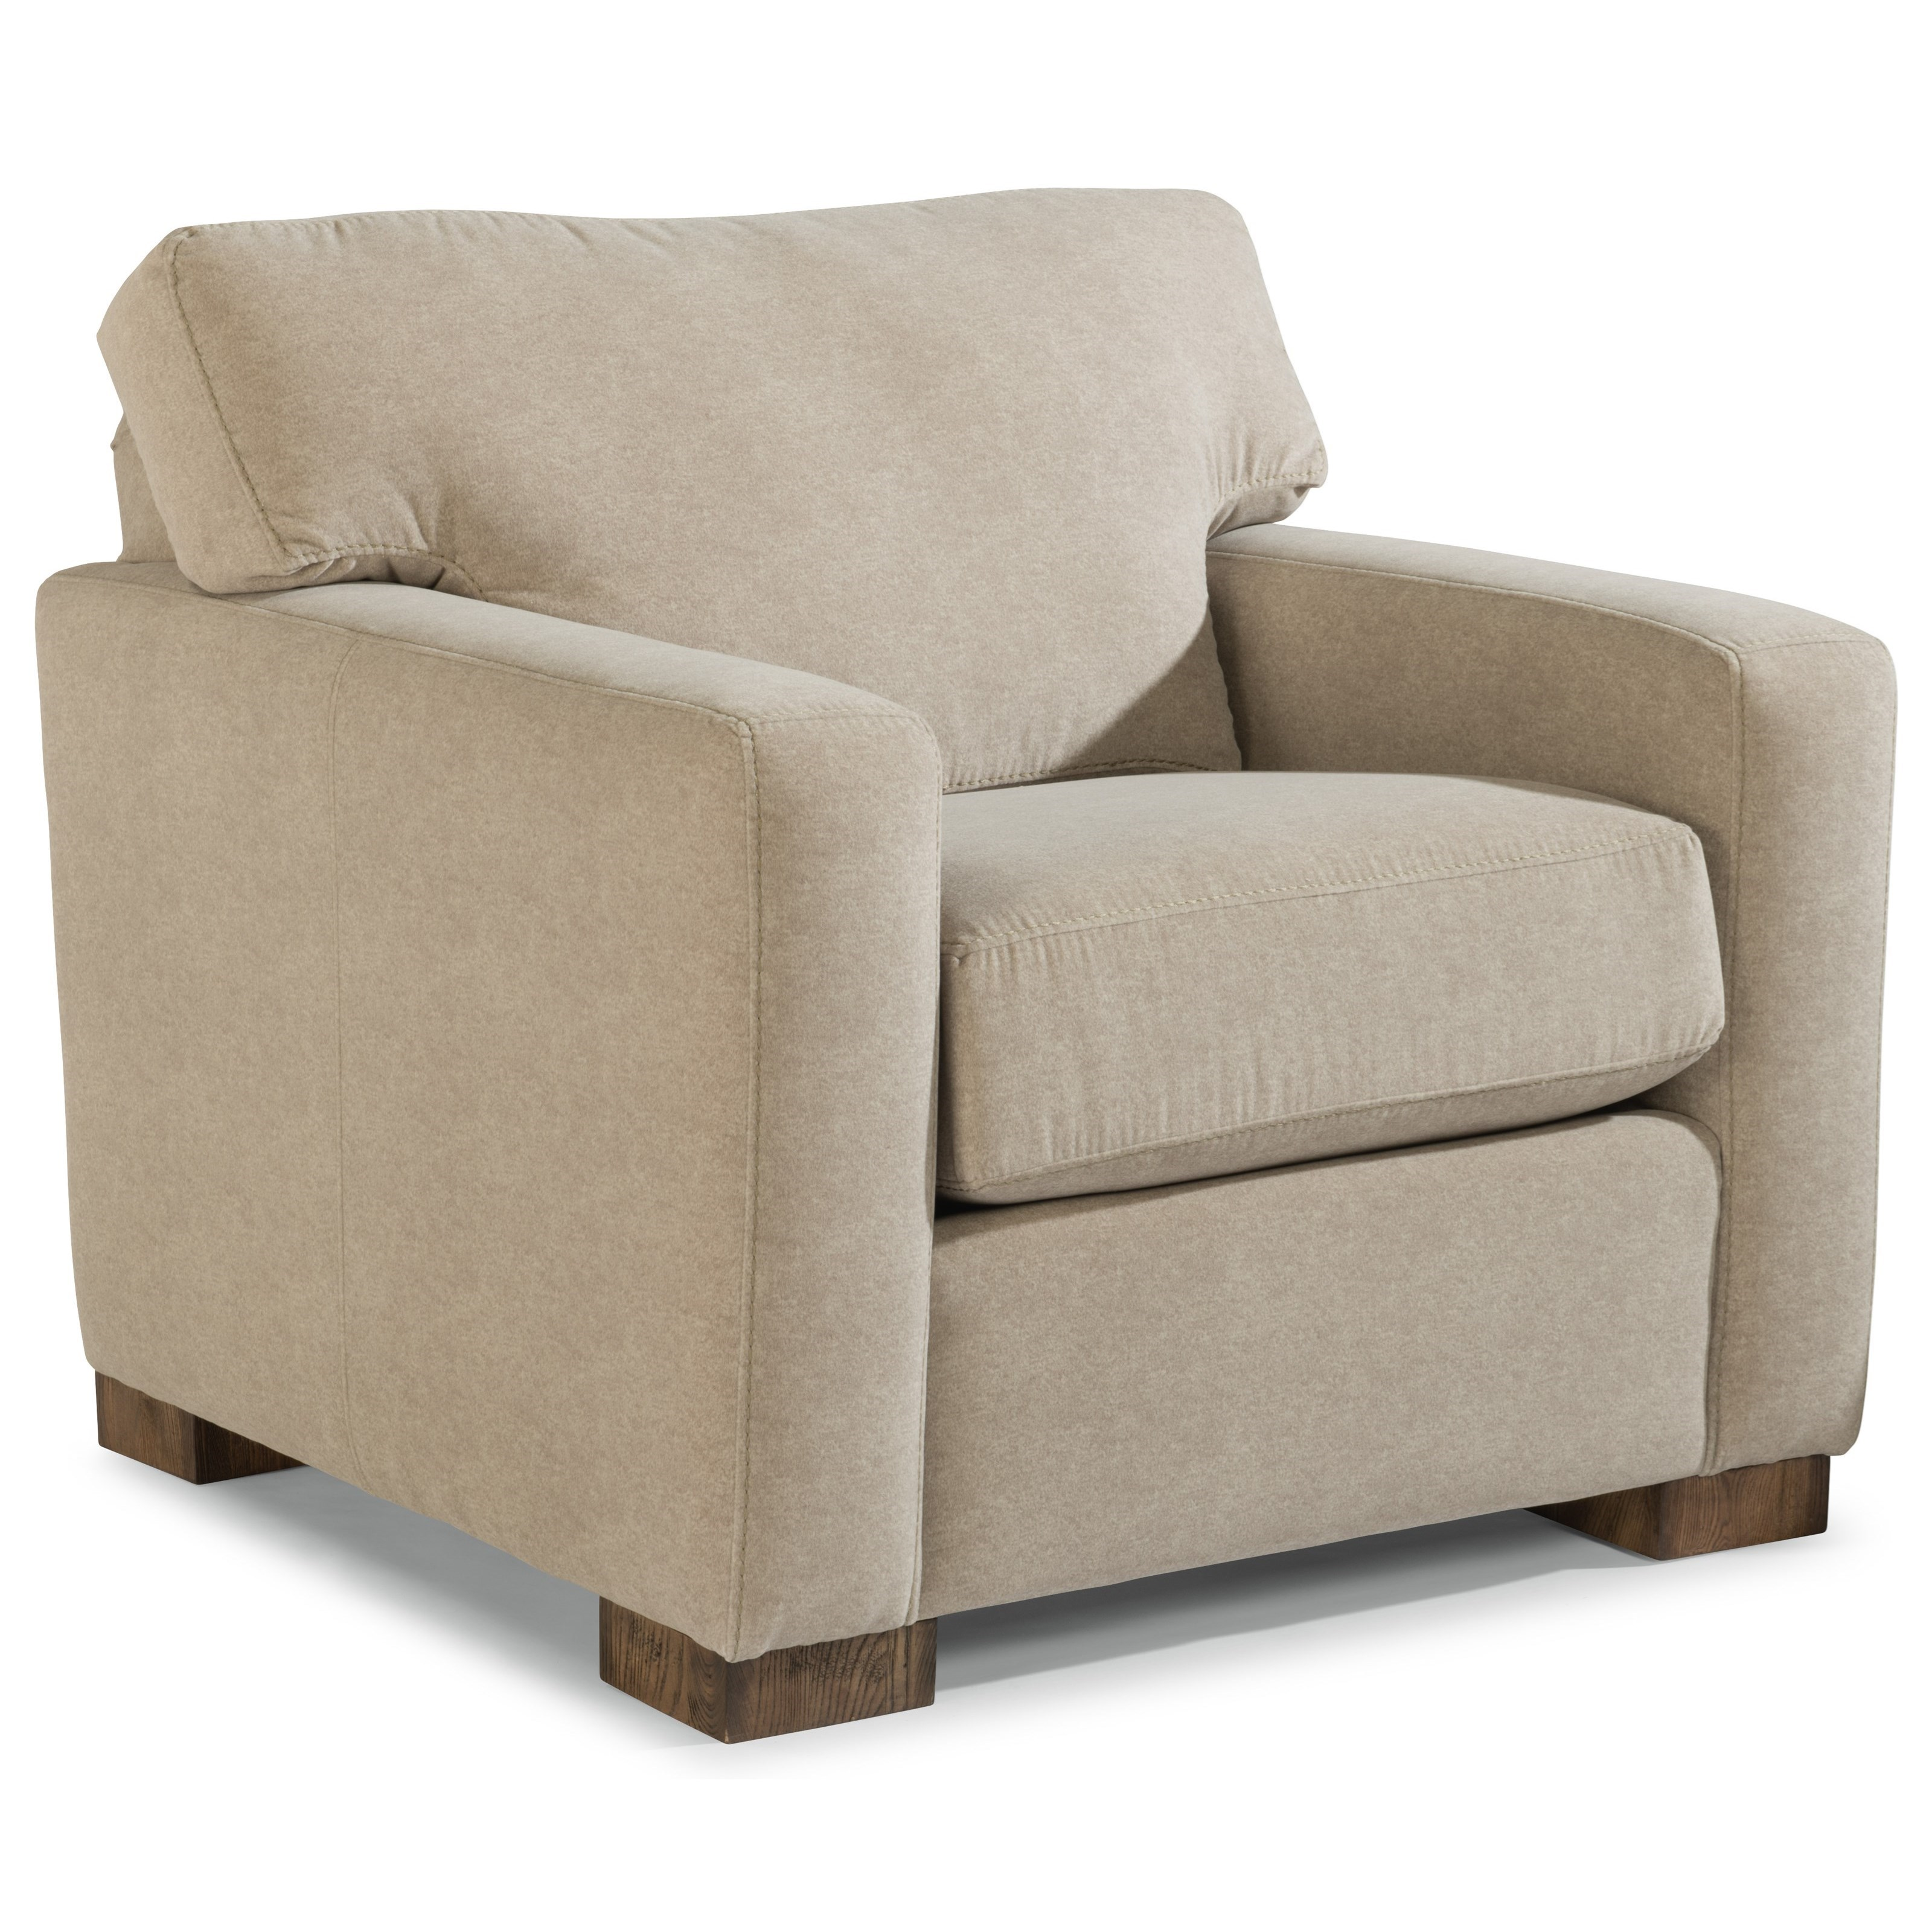 Bryant Chair by Flexsteel at Jordan's Home Furnishings